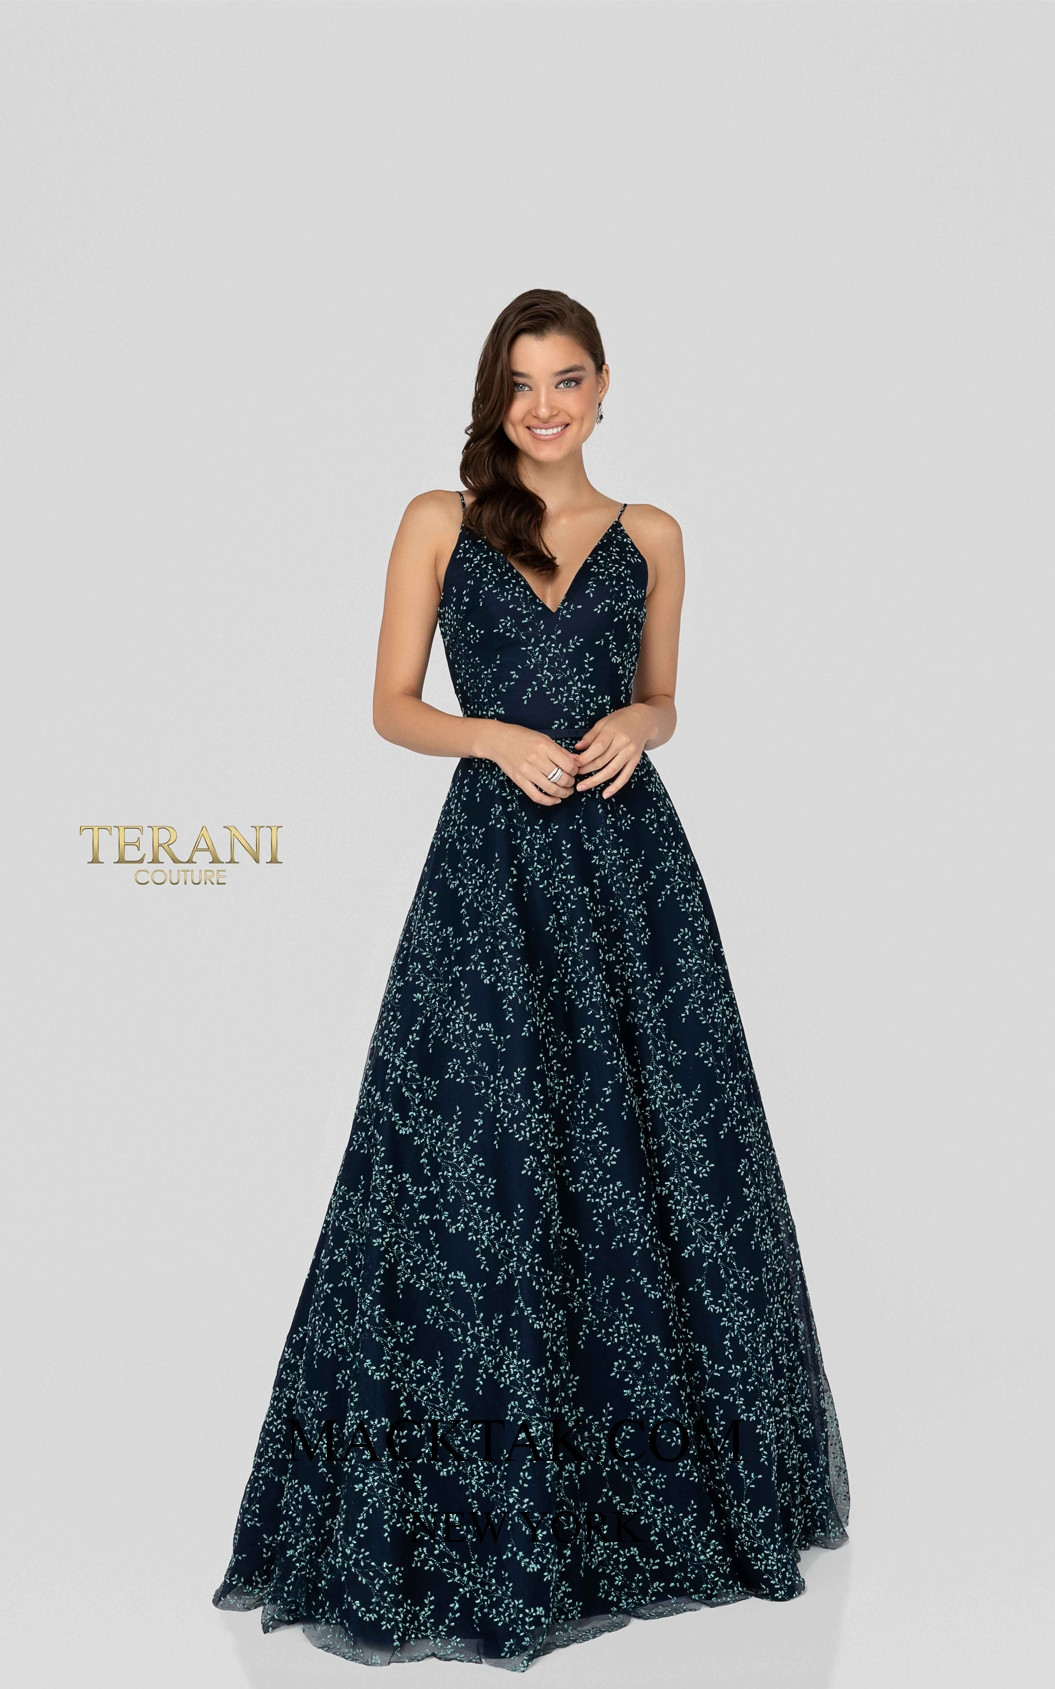 Terani 1912P8564 Front Dress